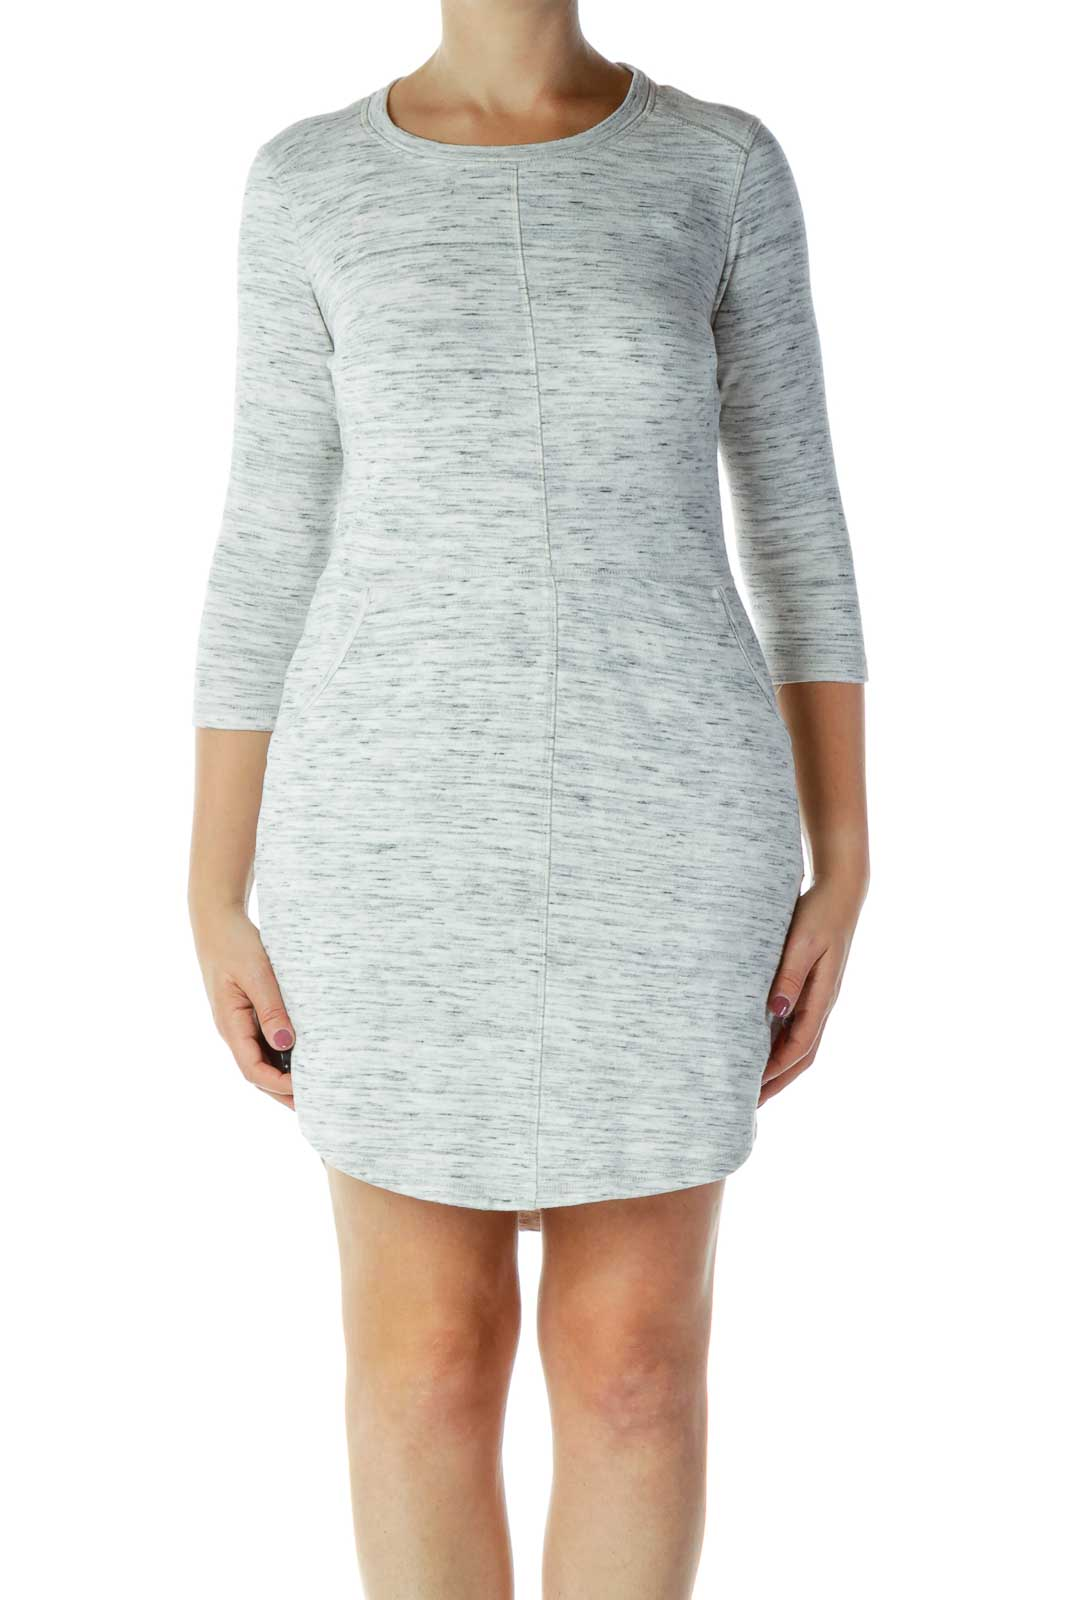 Gray Mottled Knit Dress Front